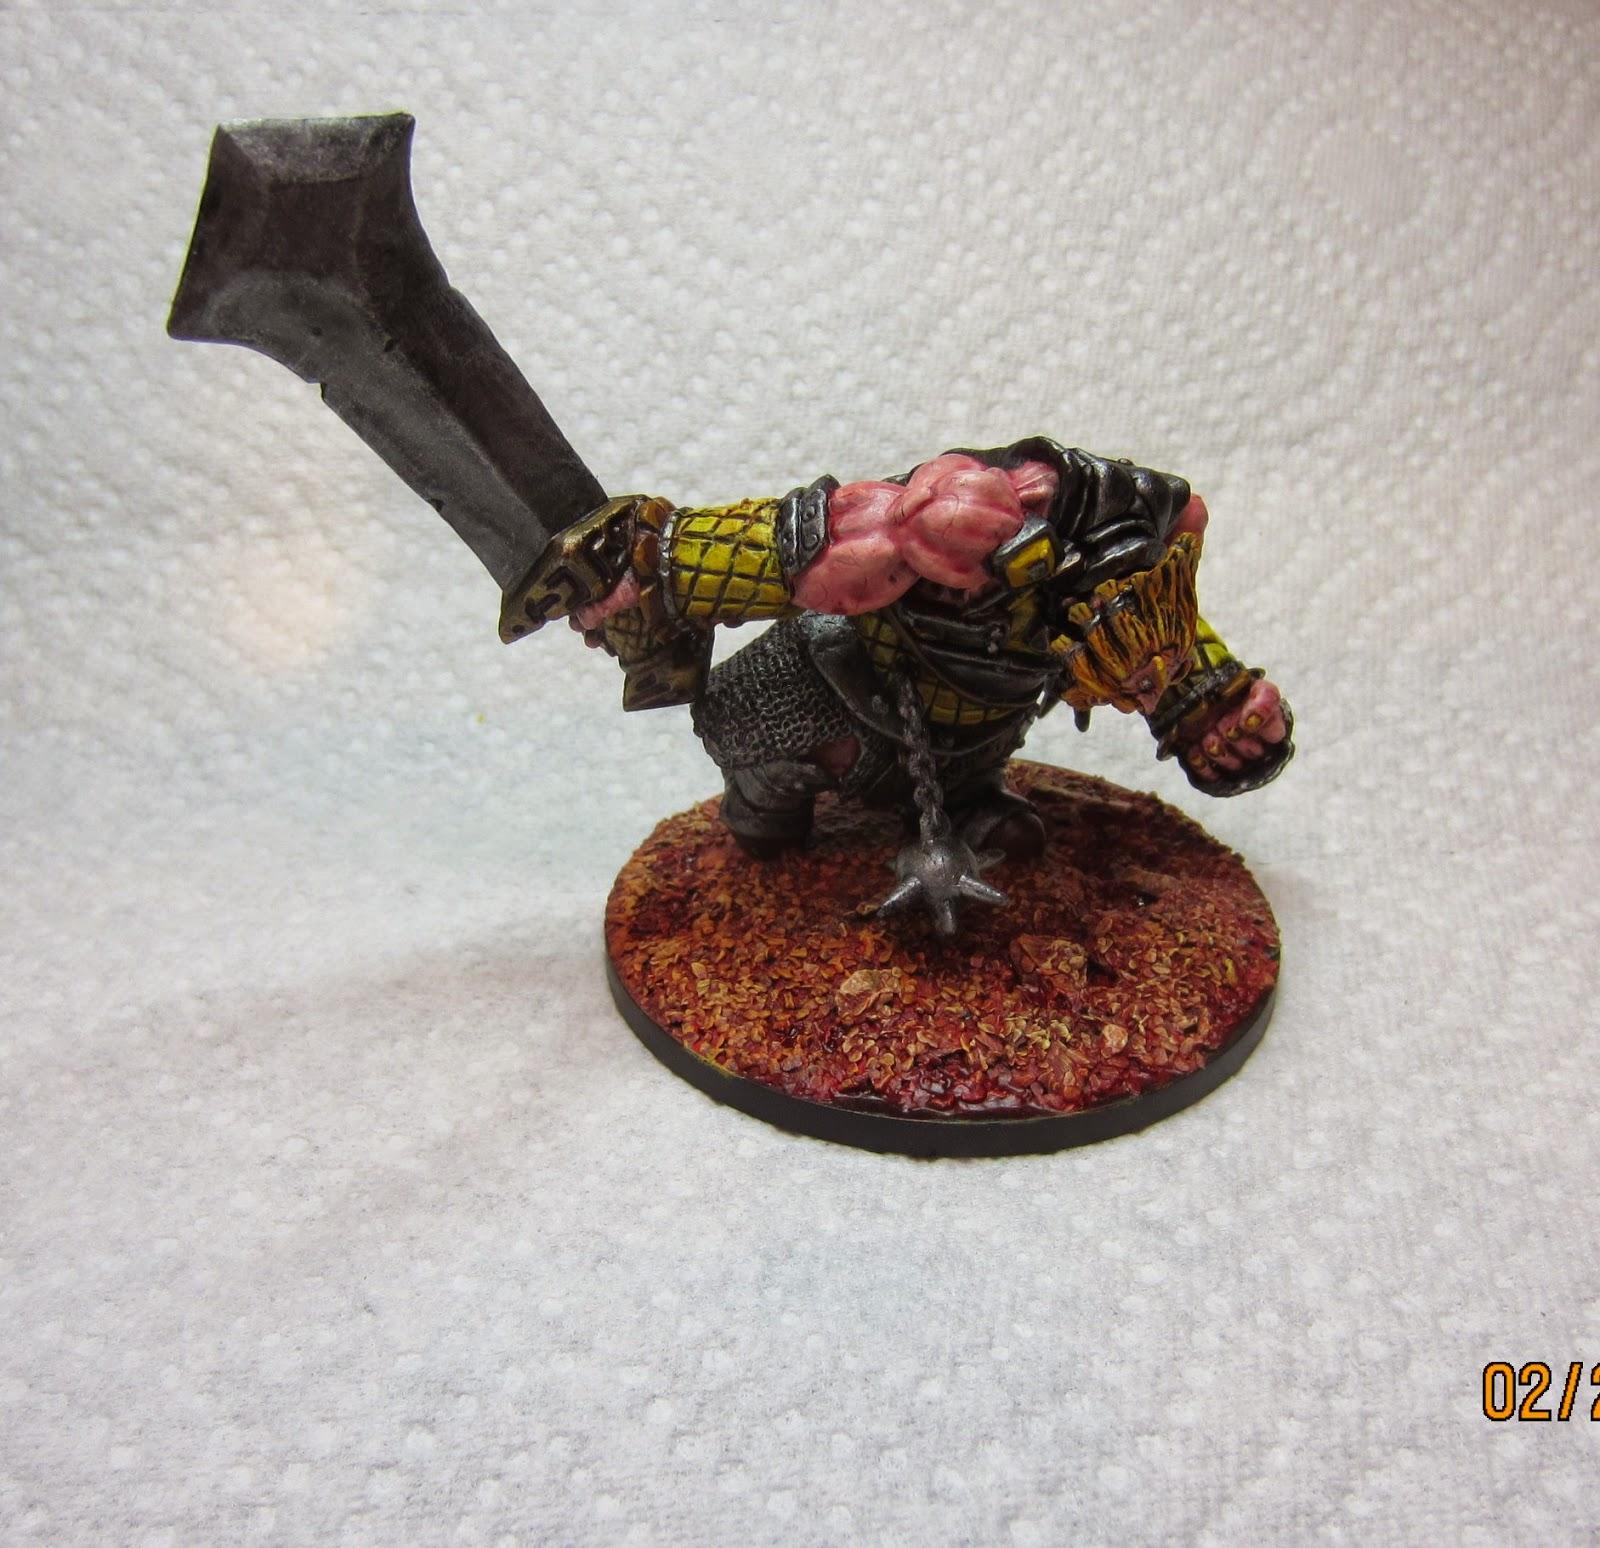 Mini Swelter: Reaper Bones I Fire Giant Warrior and Bones ...